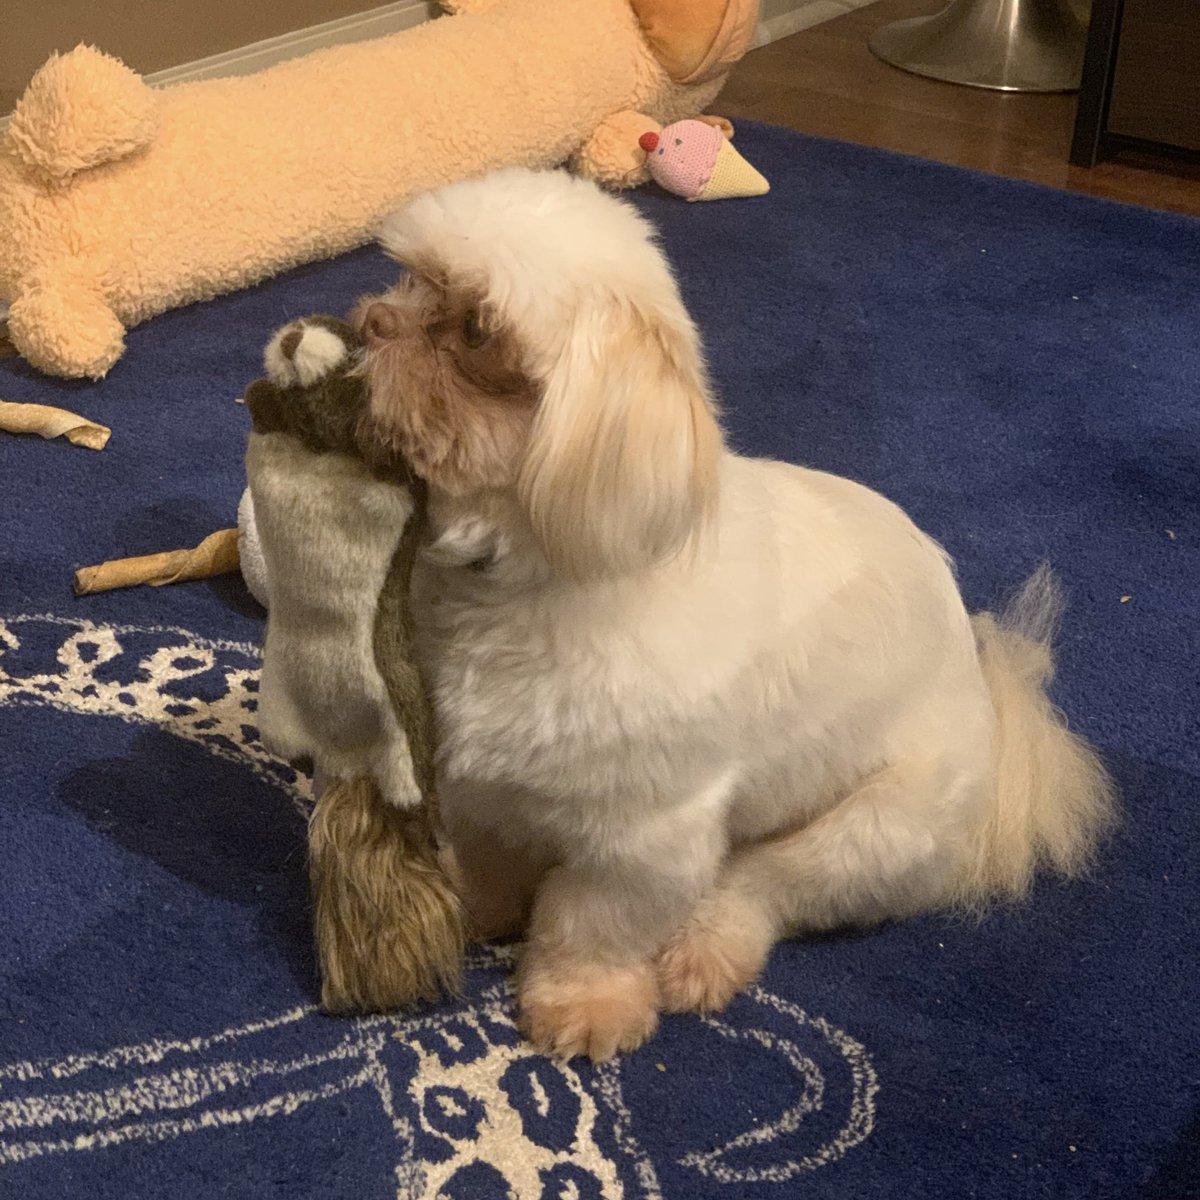 @jmfinn Simba is offering her his favorite crinkly squirrel.